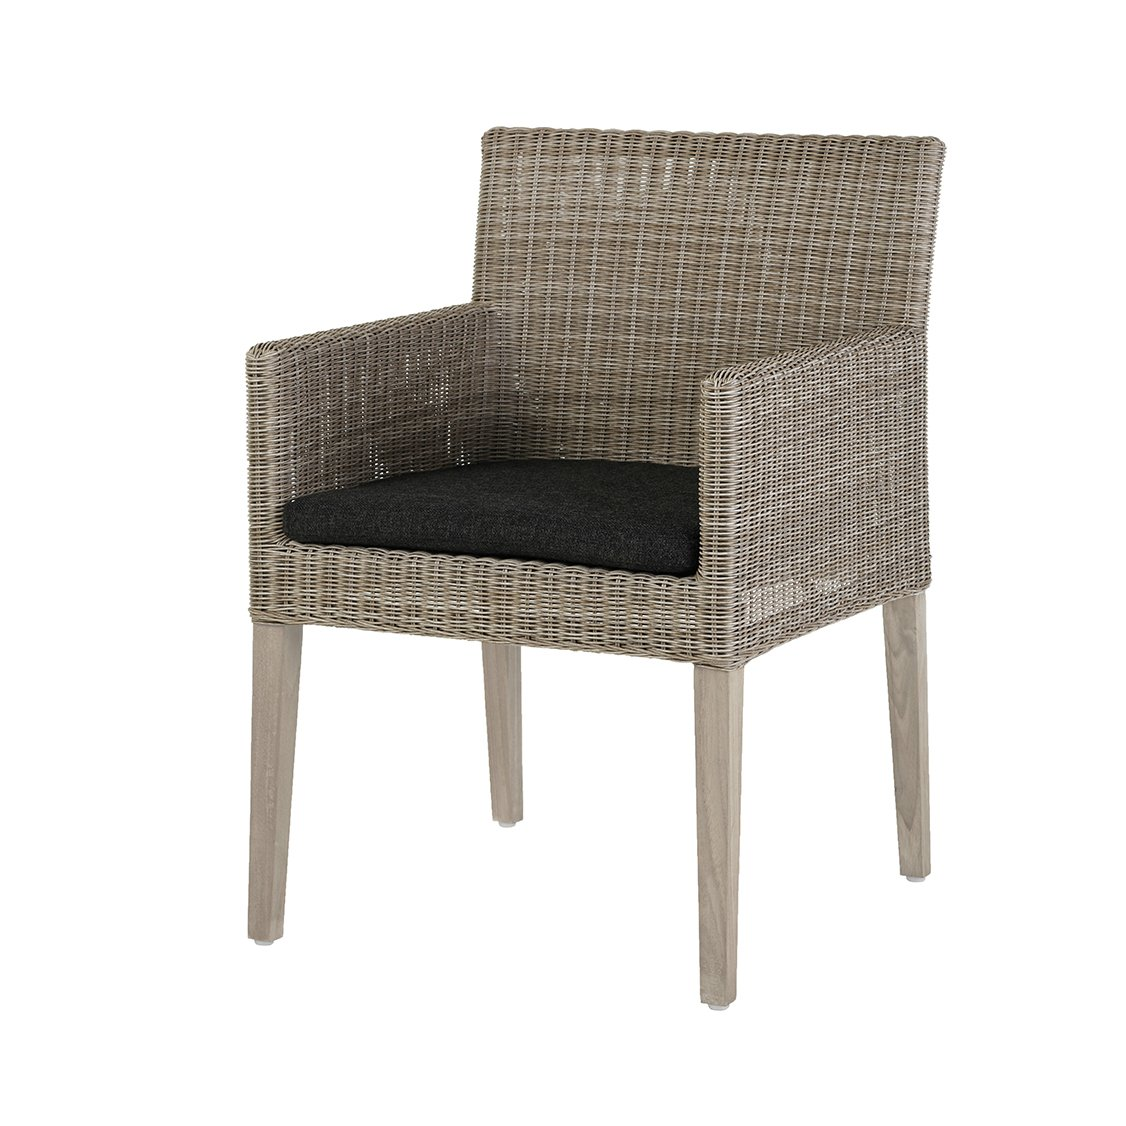 diamond garden gartenstuhl manchester armstuhl. Black Bedroom Furniture Sets. Home Design Ideas